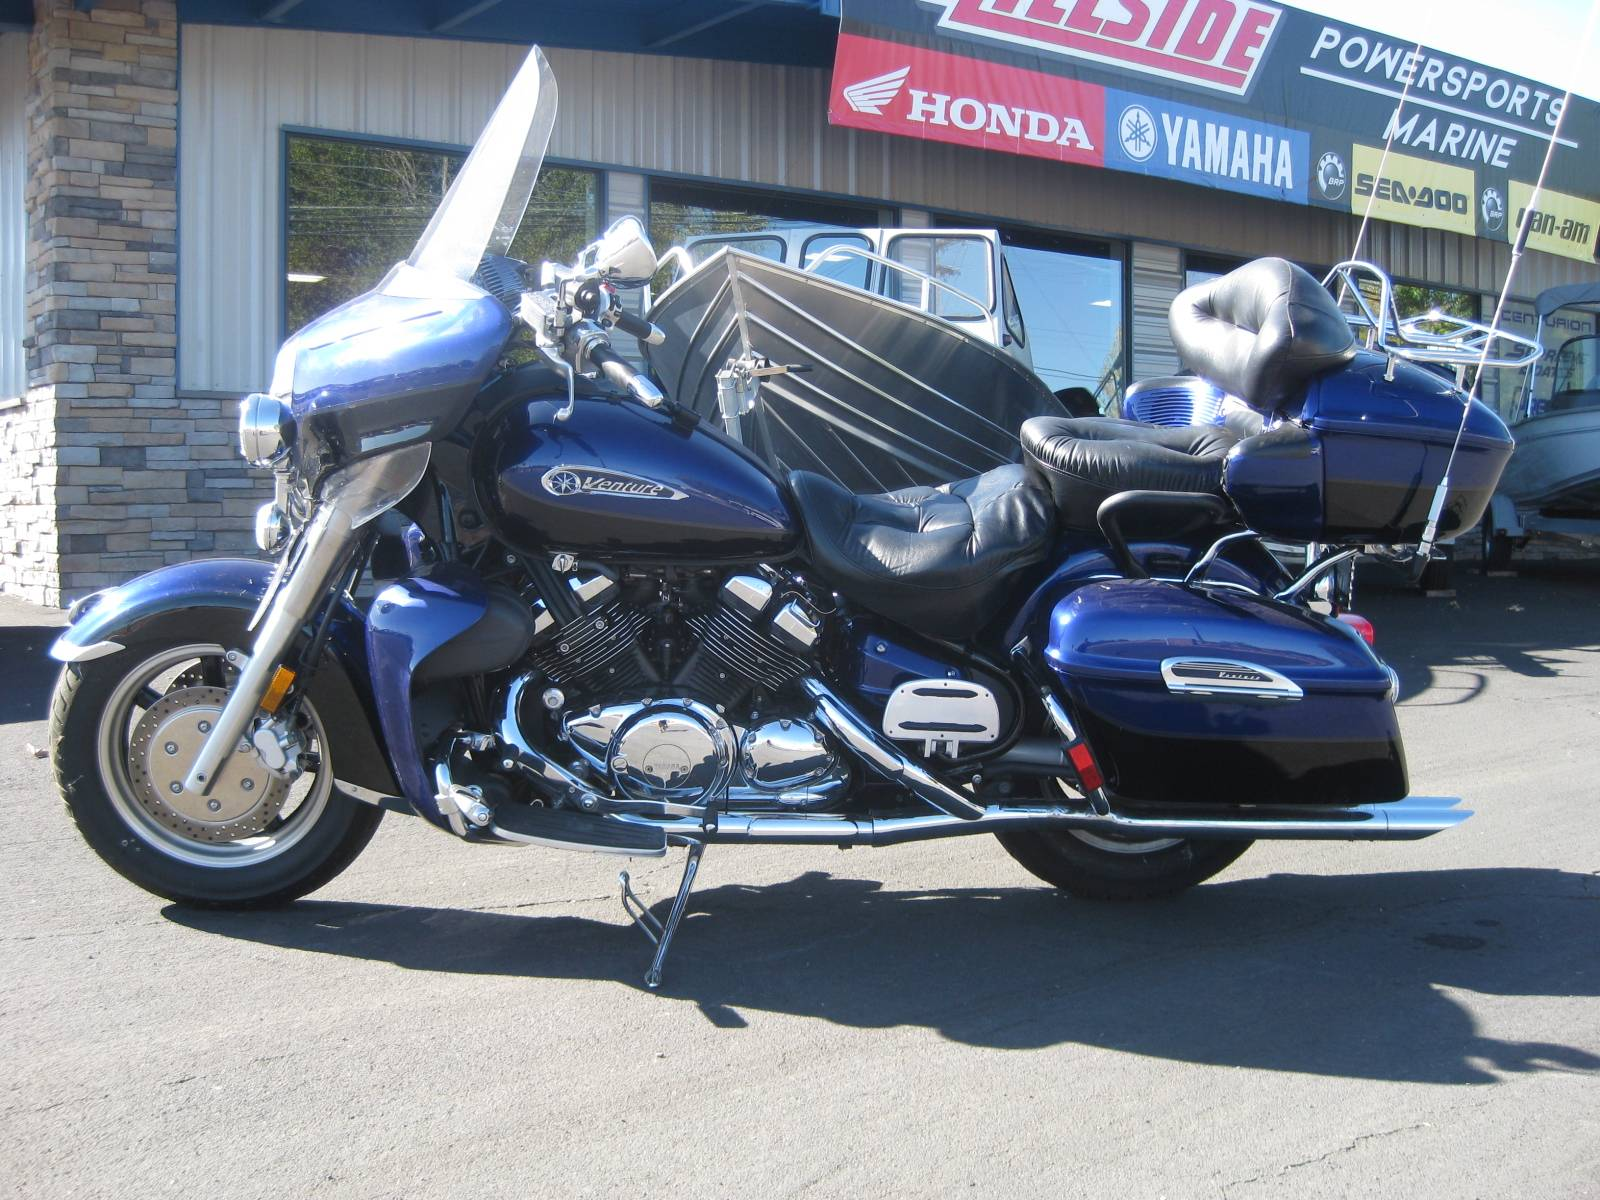 Used 2007 Yamaha Royal Star® Venture Motorcycles in Lakeport, CA ...